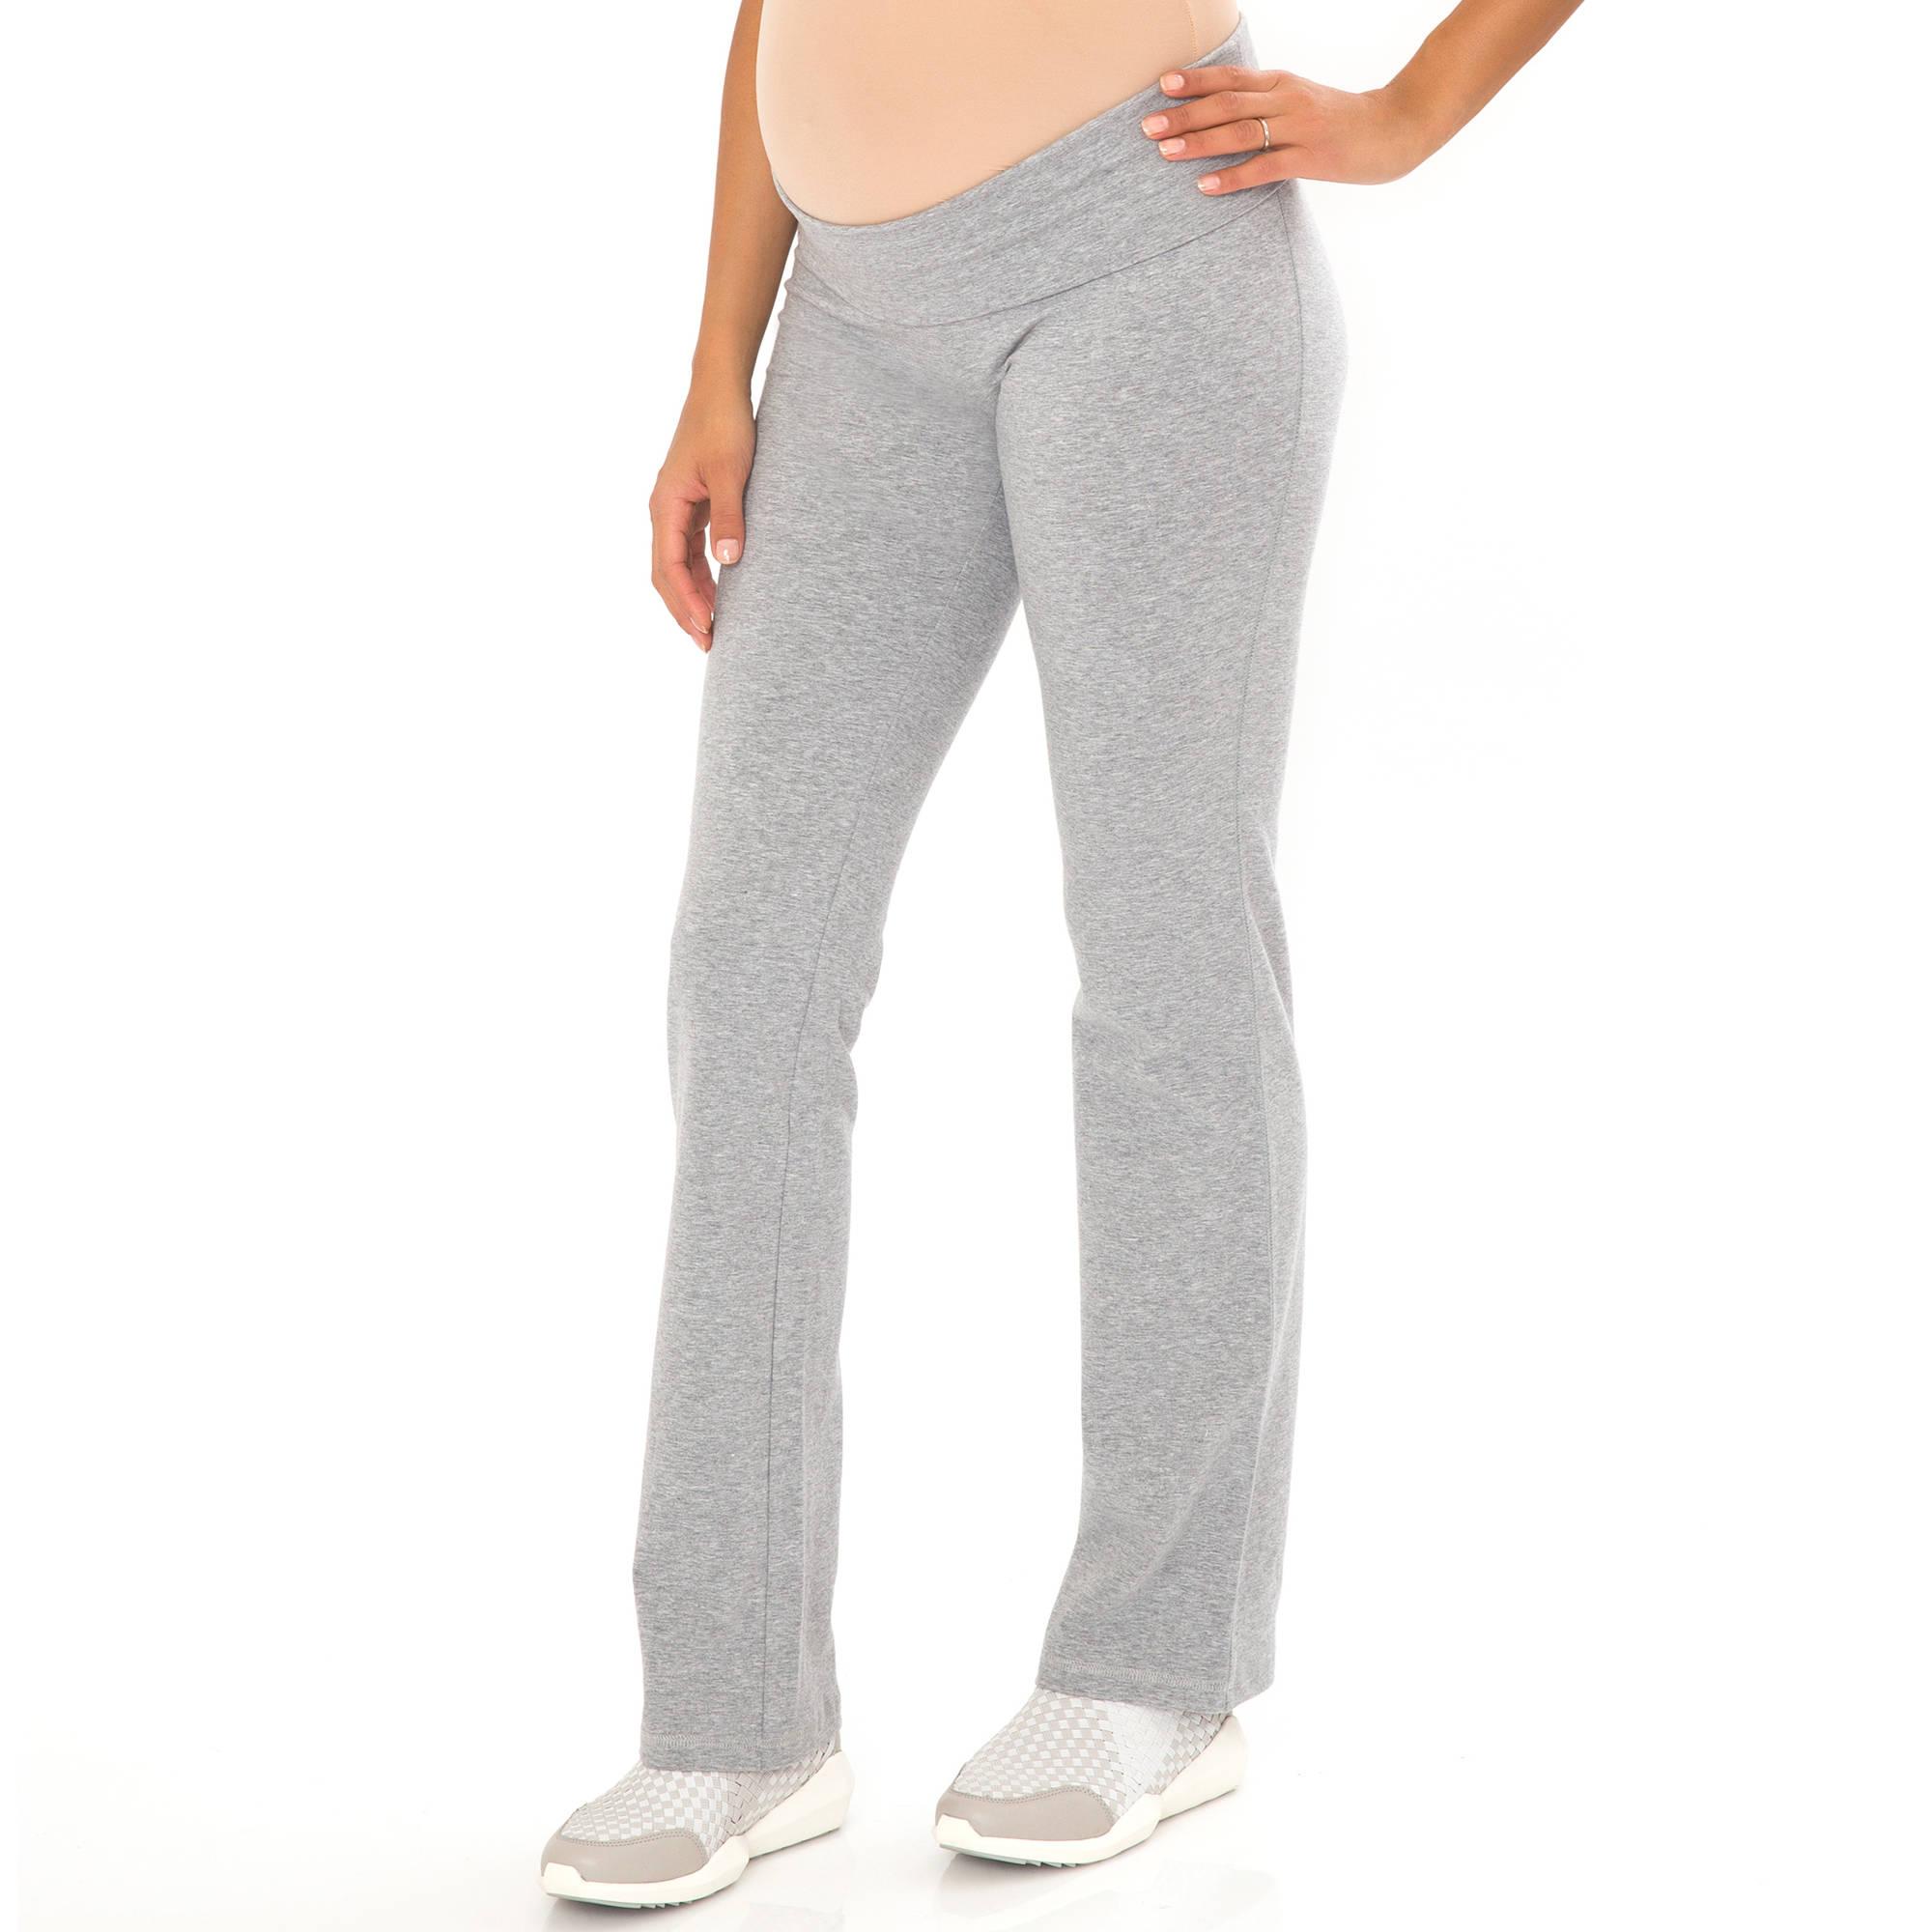 Great Expectations Maternity Yoga Pants